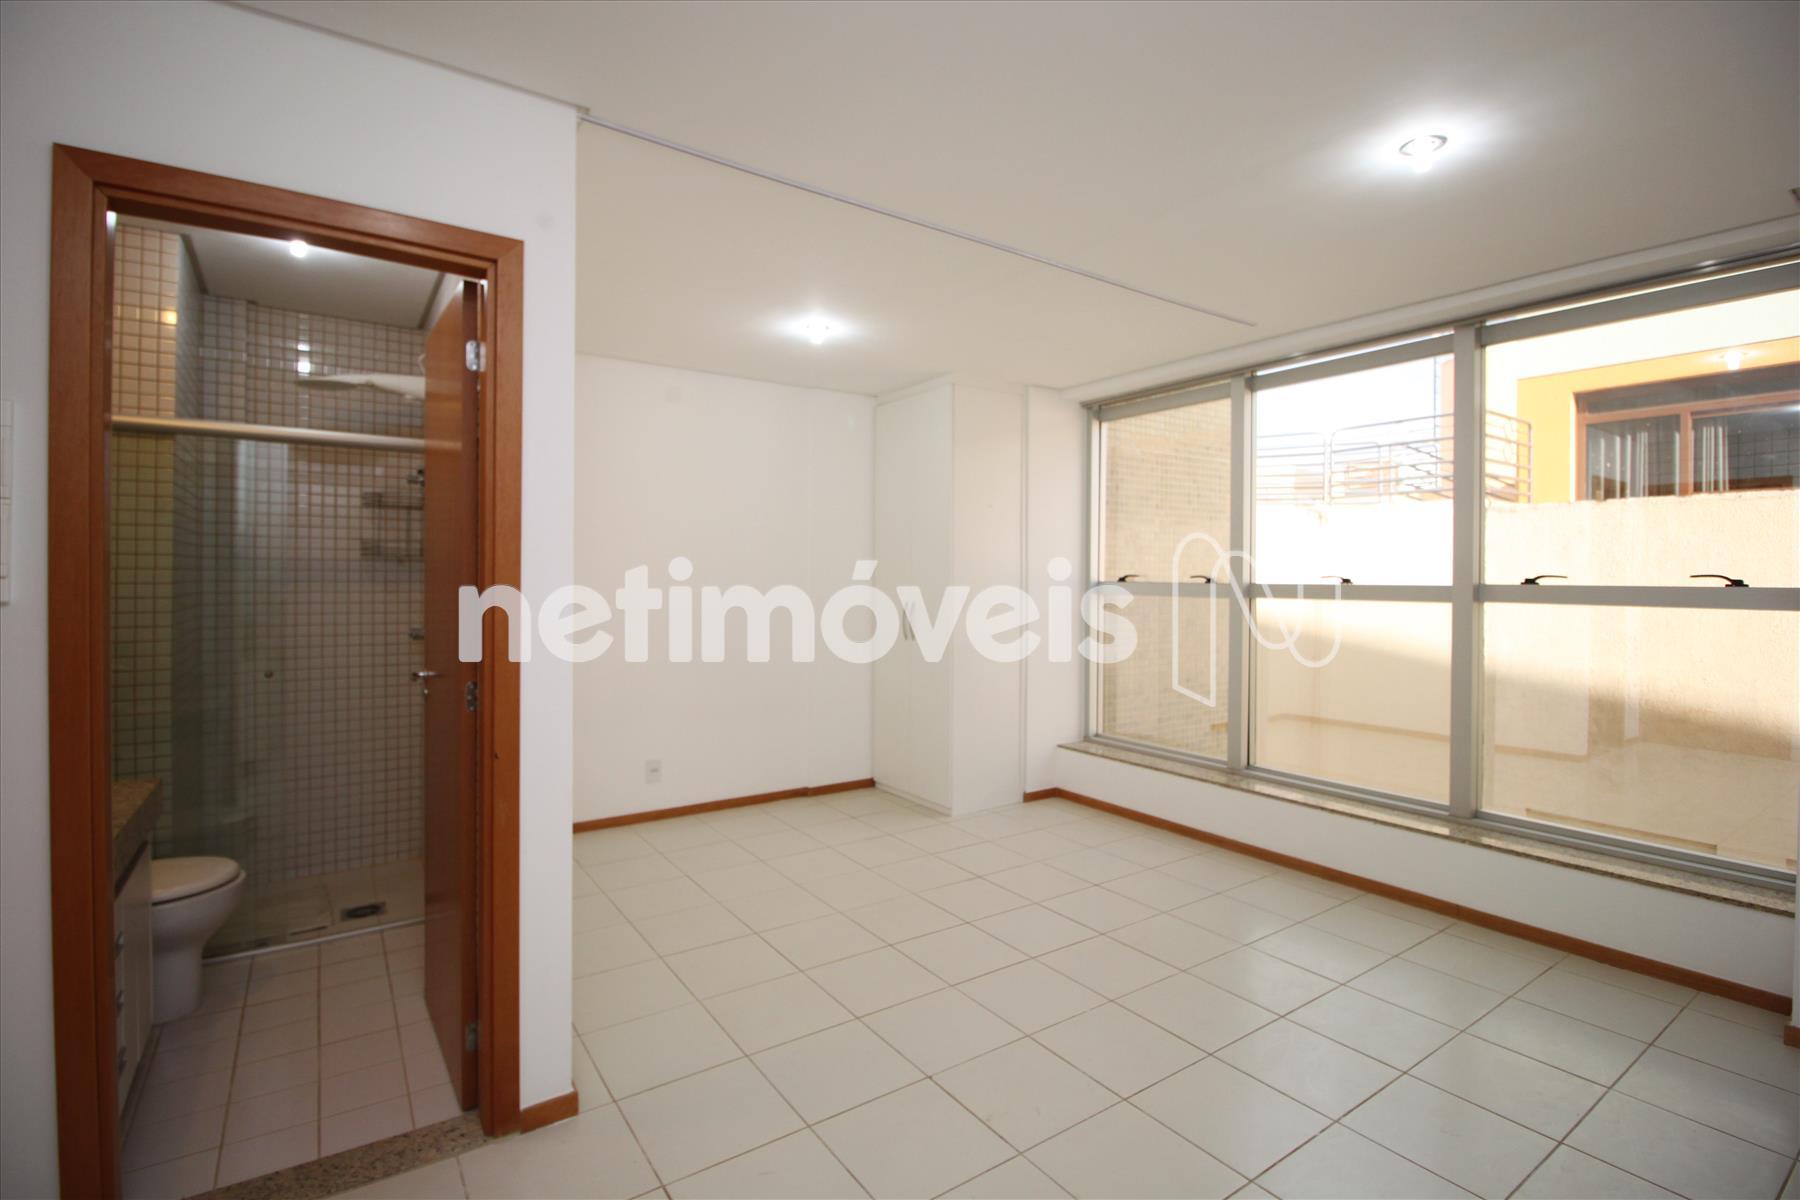 apartamento 1 quarto,kitchenette,distrito federal,lago norte,brasília,ca 11,shin ca,next,centro de atividades,kit,